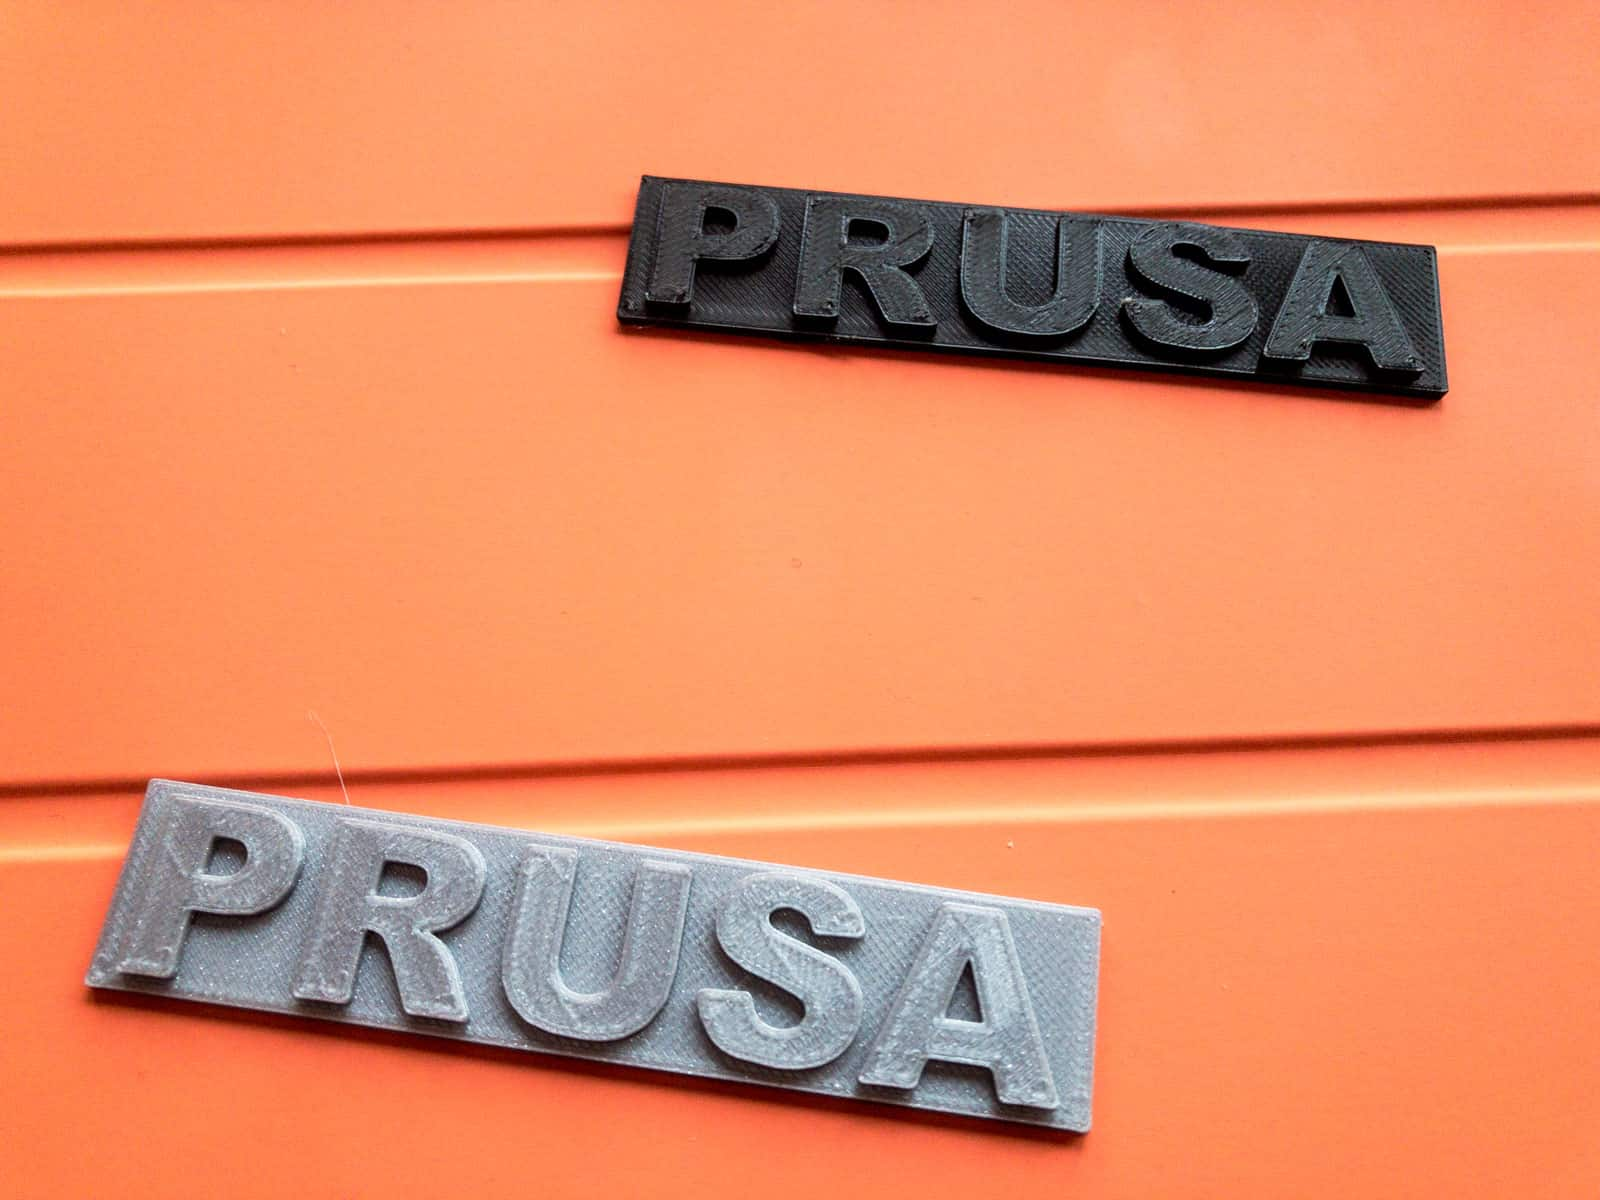 2021 mit Prusa